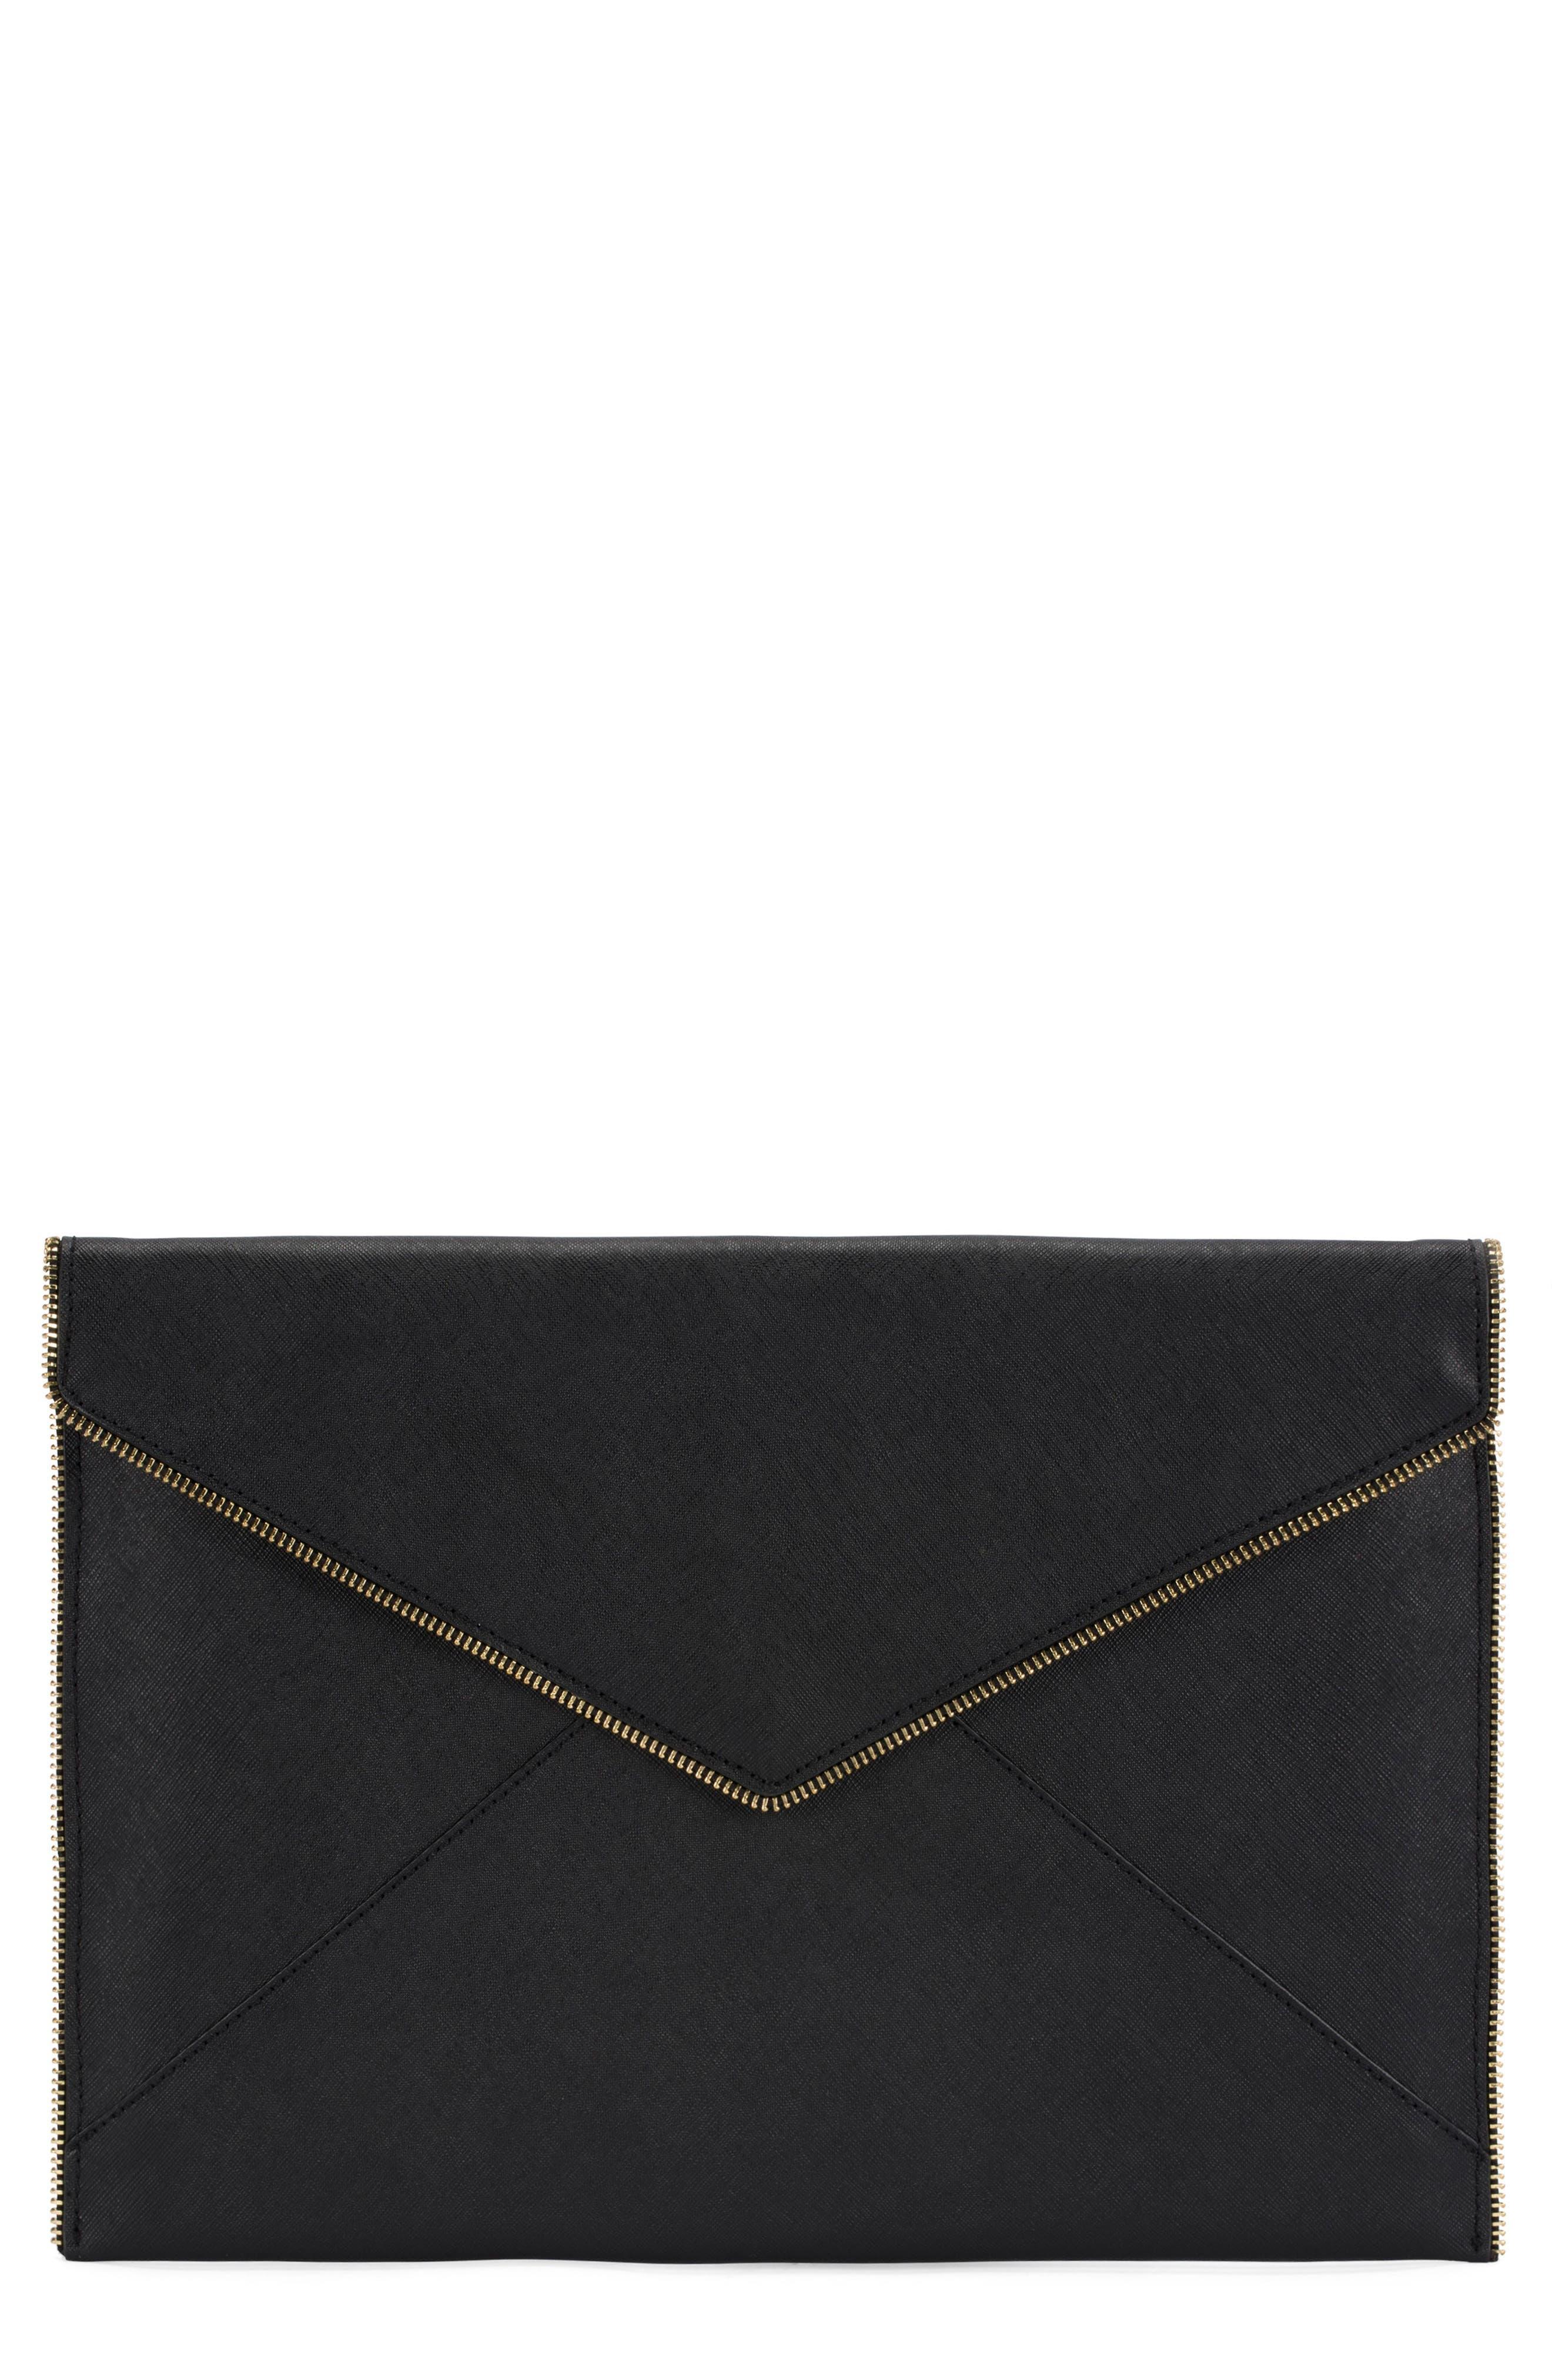 Leo Leather 13-Inch Laptop Case,                             Main thumbnail 1, color,                             001